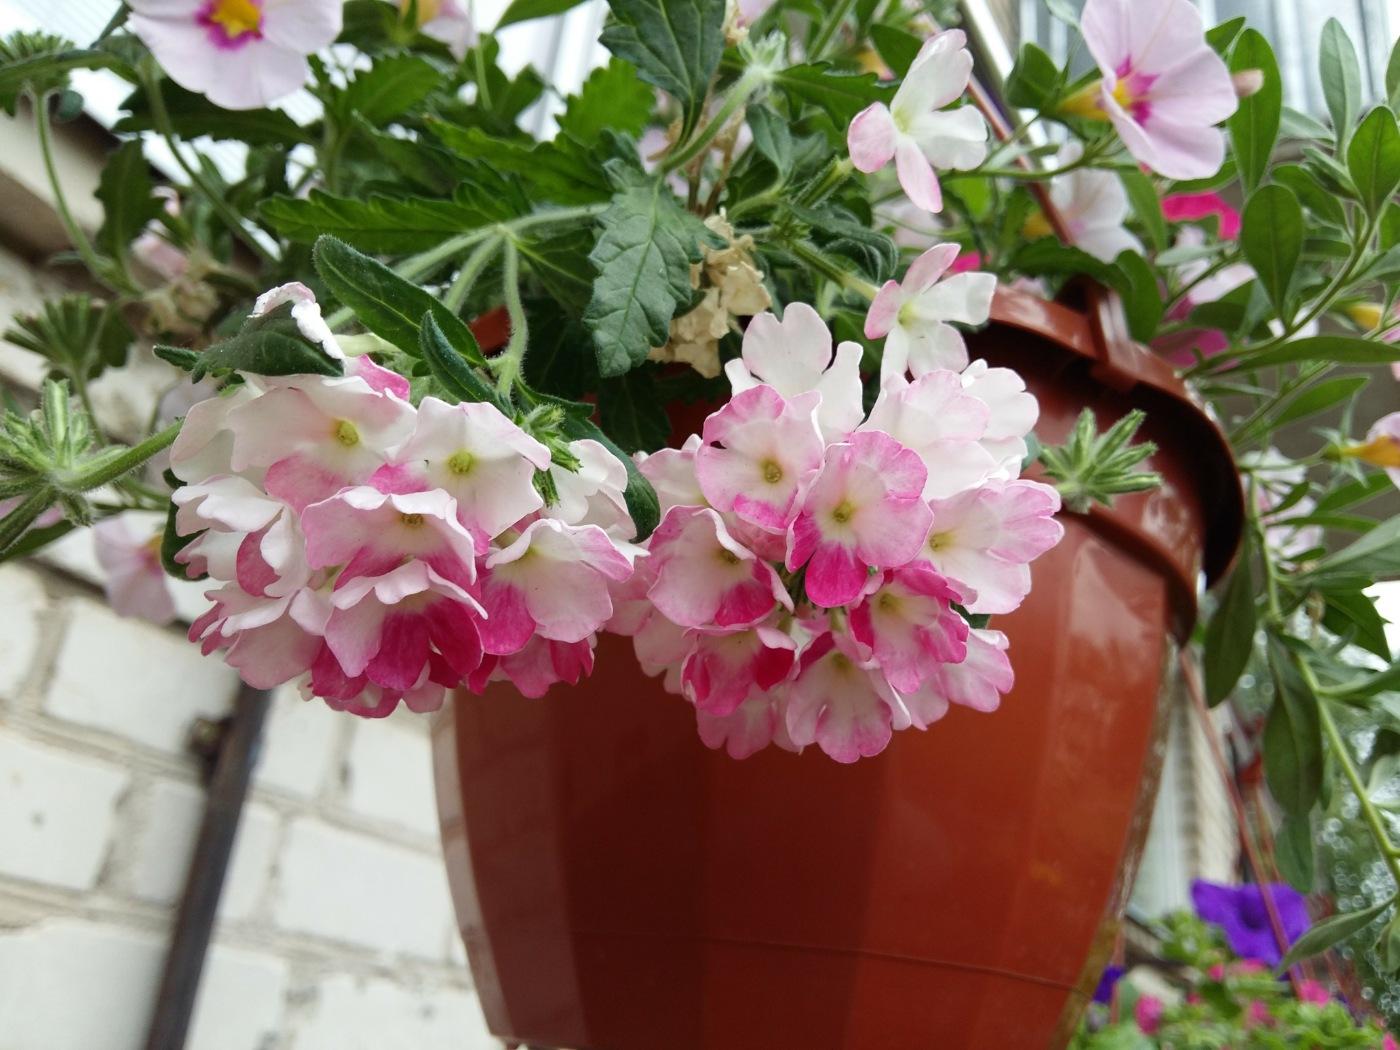 Flowers by uzkuraitiene62